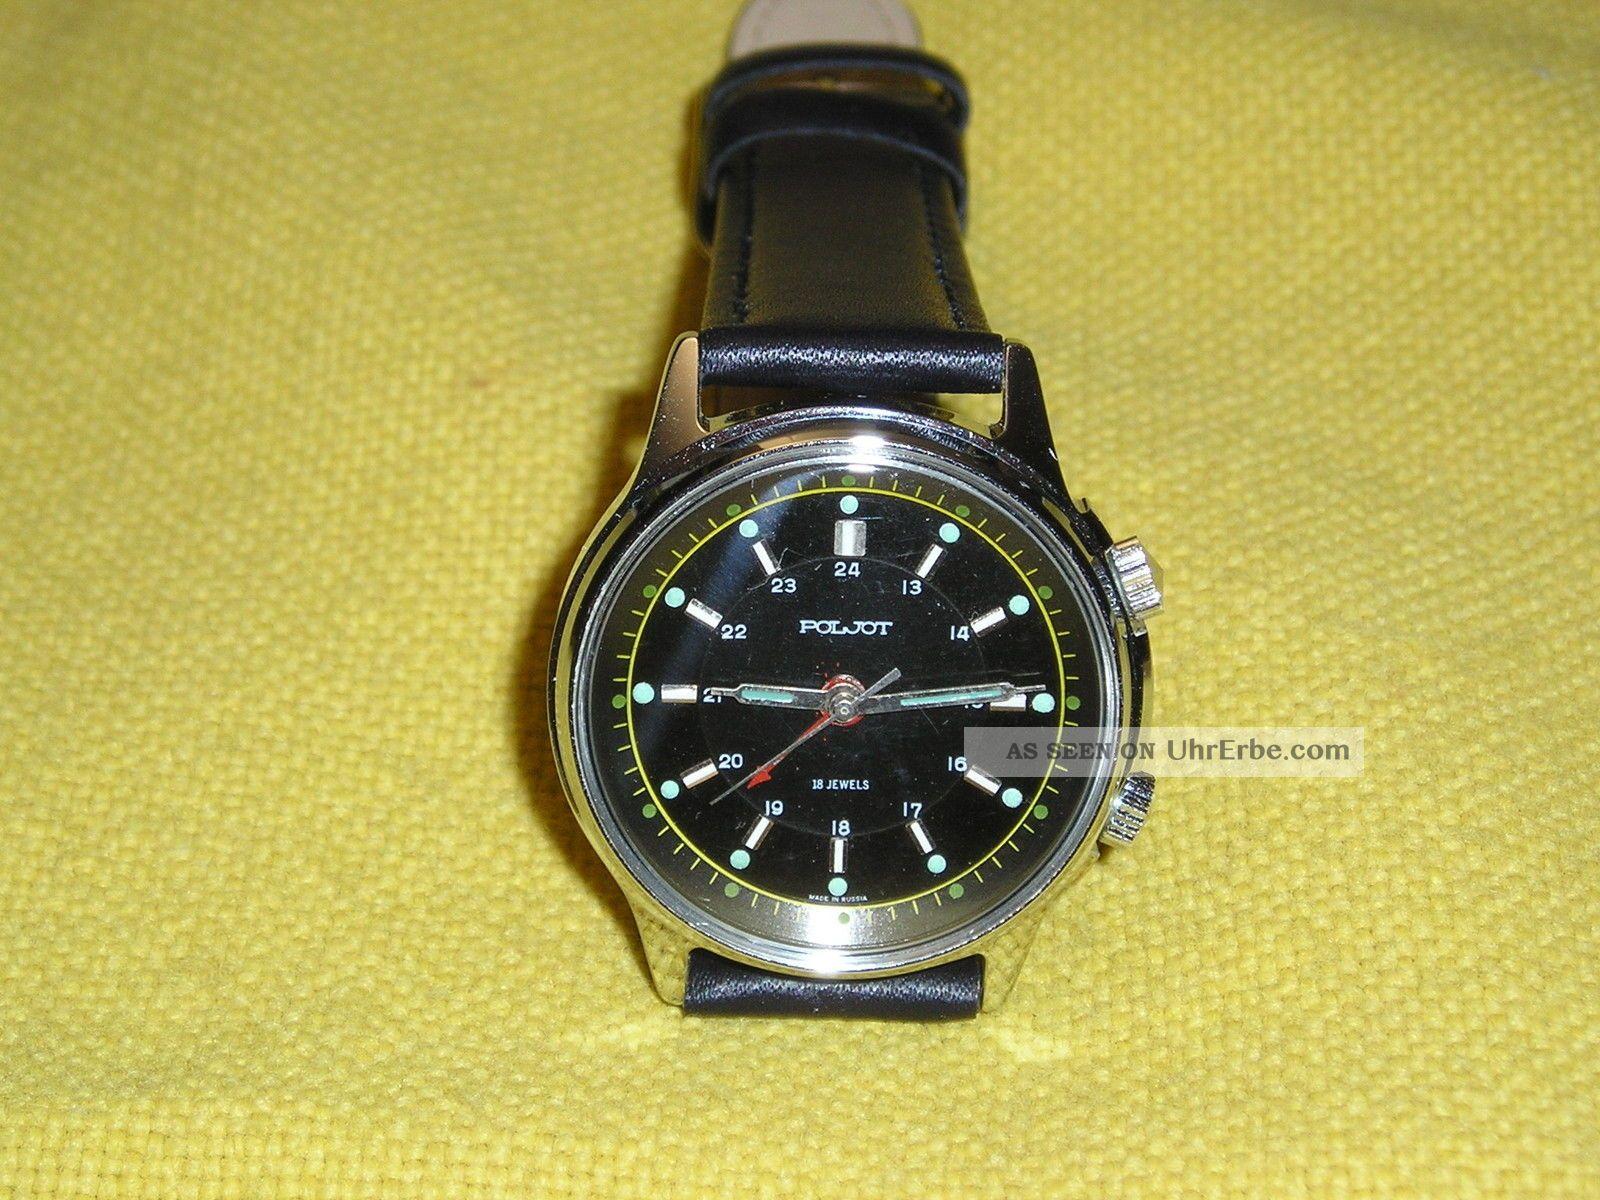 Poljot Herren Armbandwecker,  Manufaktur - Kaliber 2612,  18 Steine Bauj.  Ca.  1990 Armbanduhren Bild